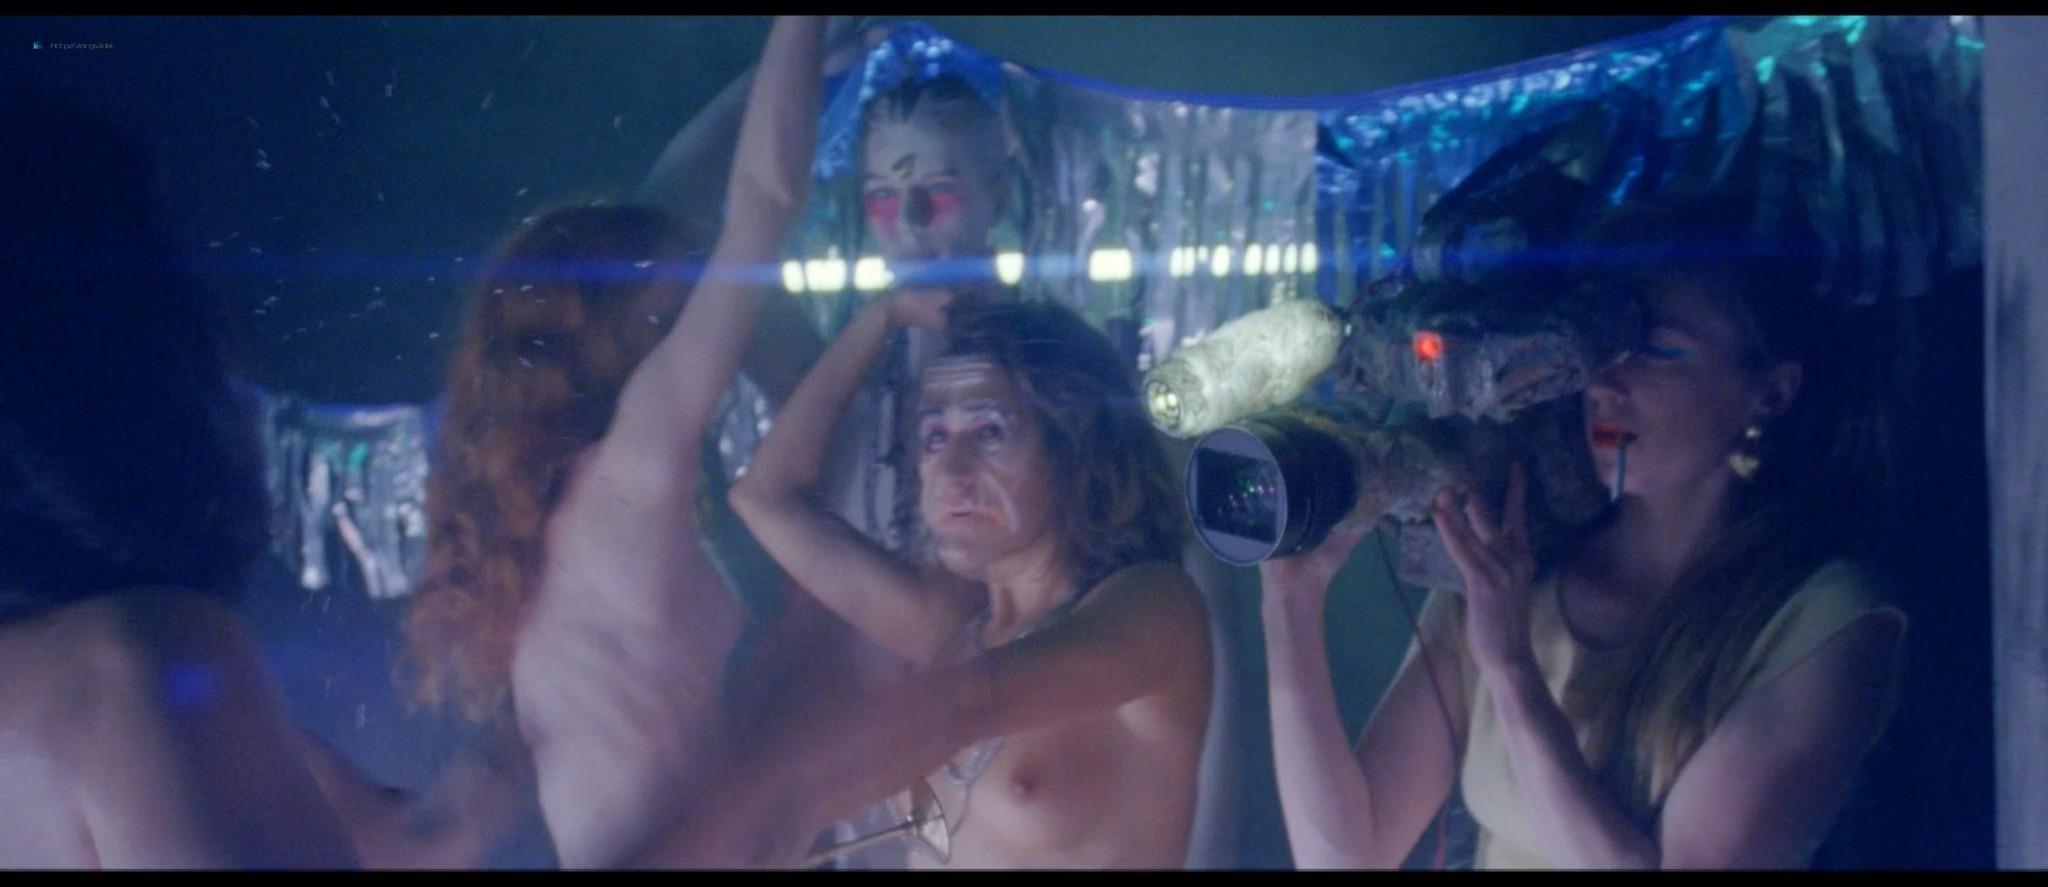 Vimala Pons nude Pauline Jacquard, Lola Créton asnd other nude too - Ultra pulpe (2018) HD 1080p Web (9)